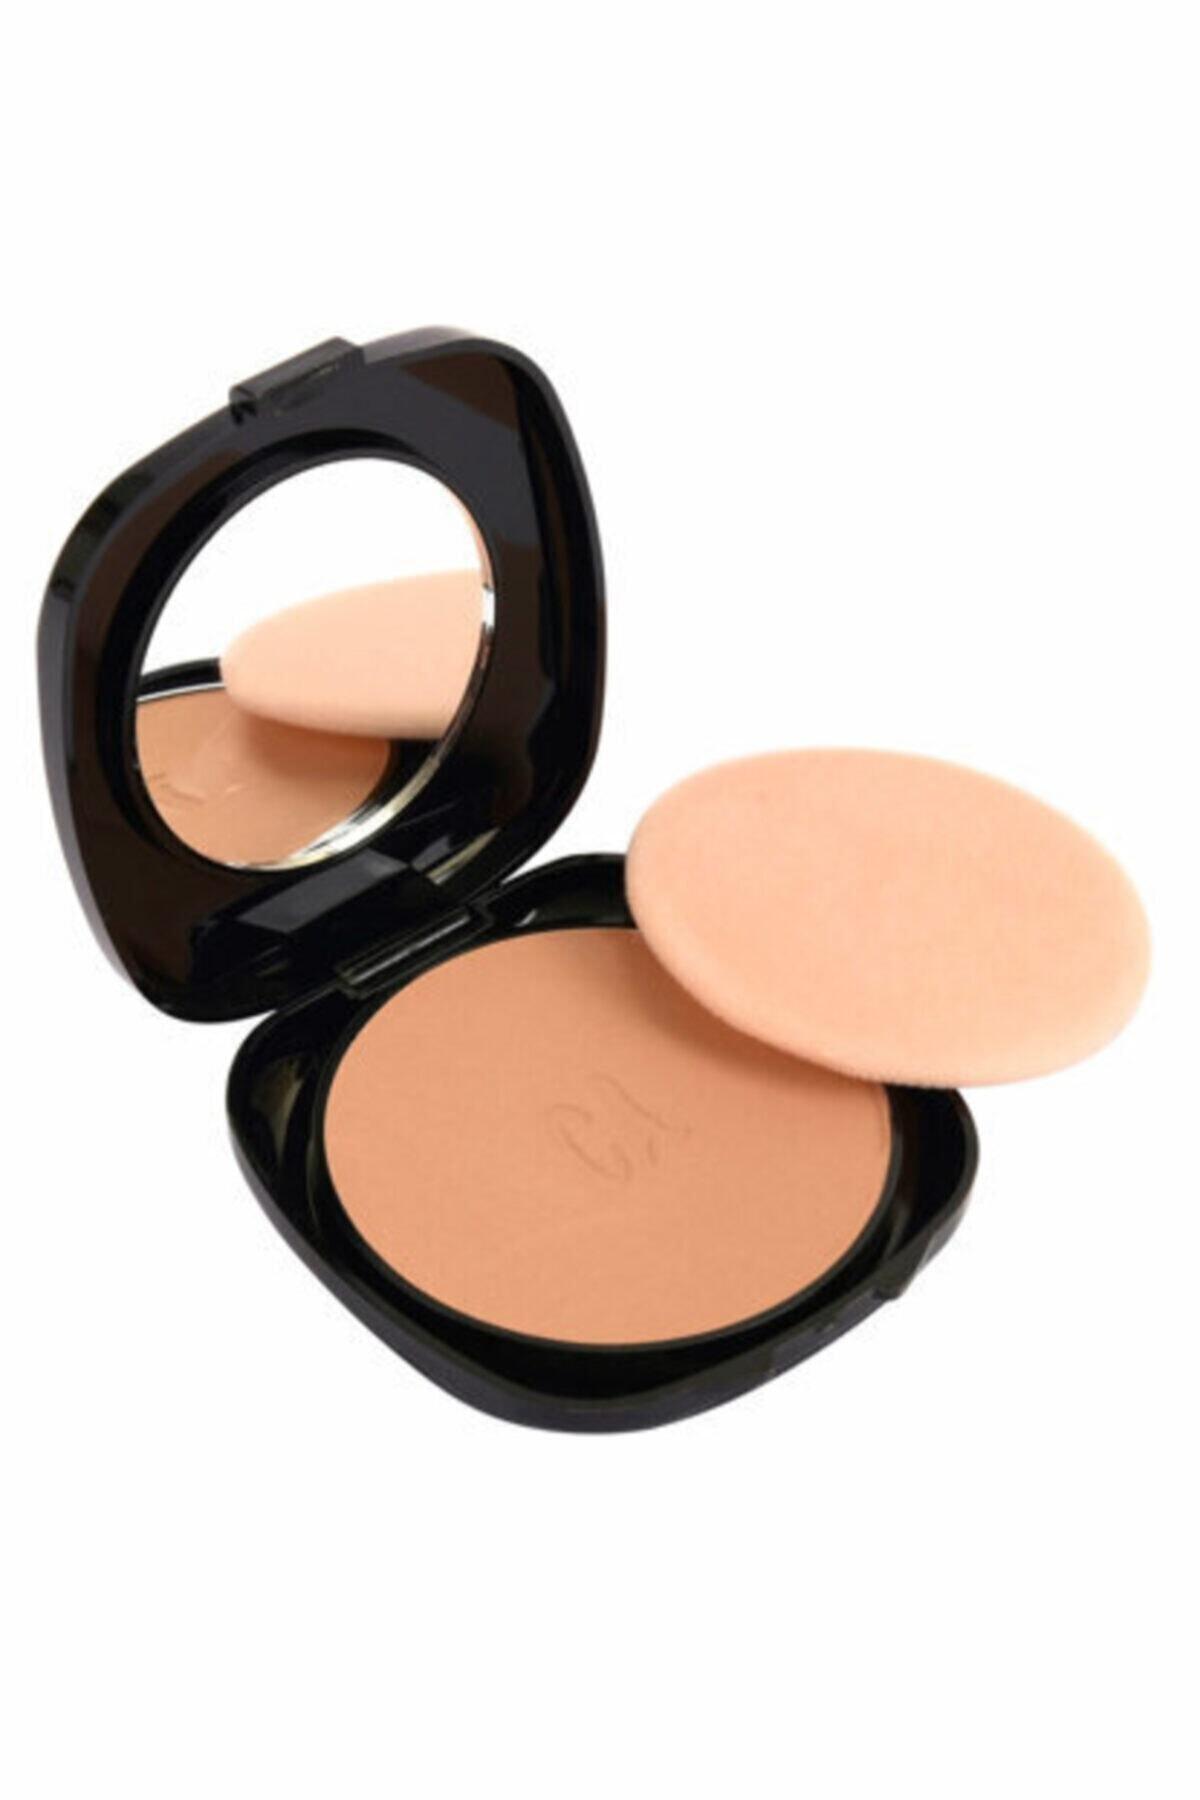 Catherine Arley Pudra - Compact Powder 07 8691167026051 1